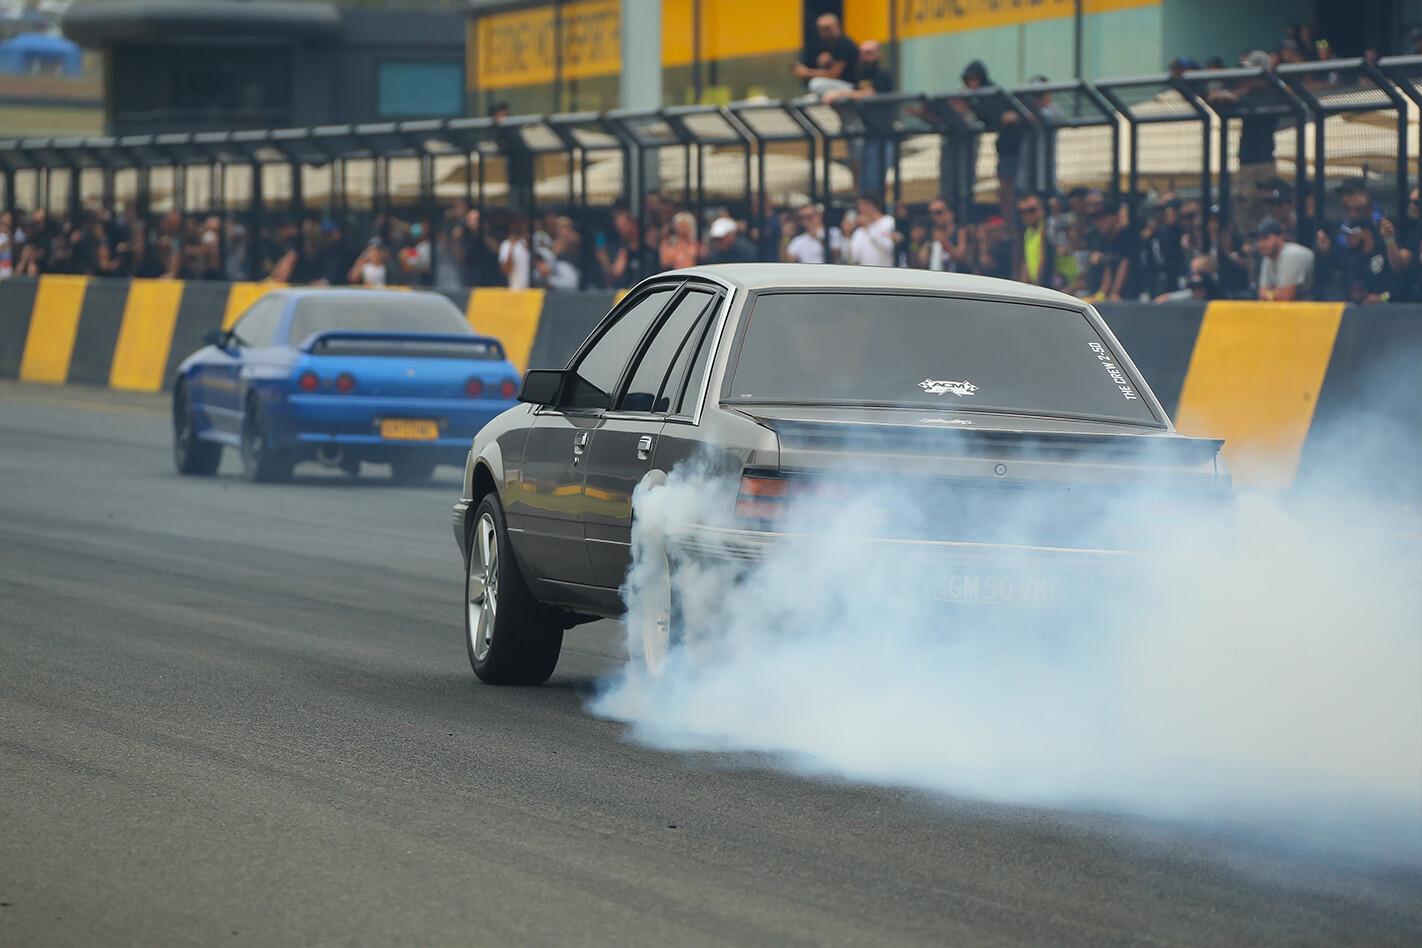 Holden Commodore vs GTR at Powercruise